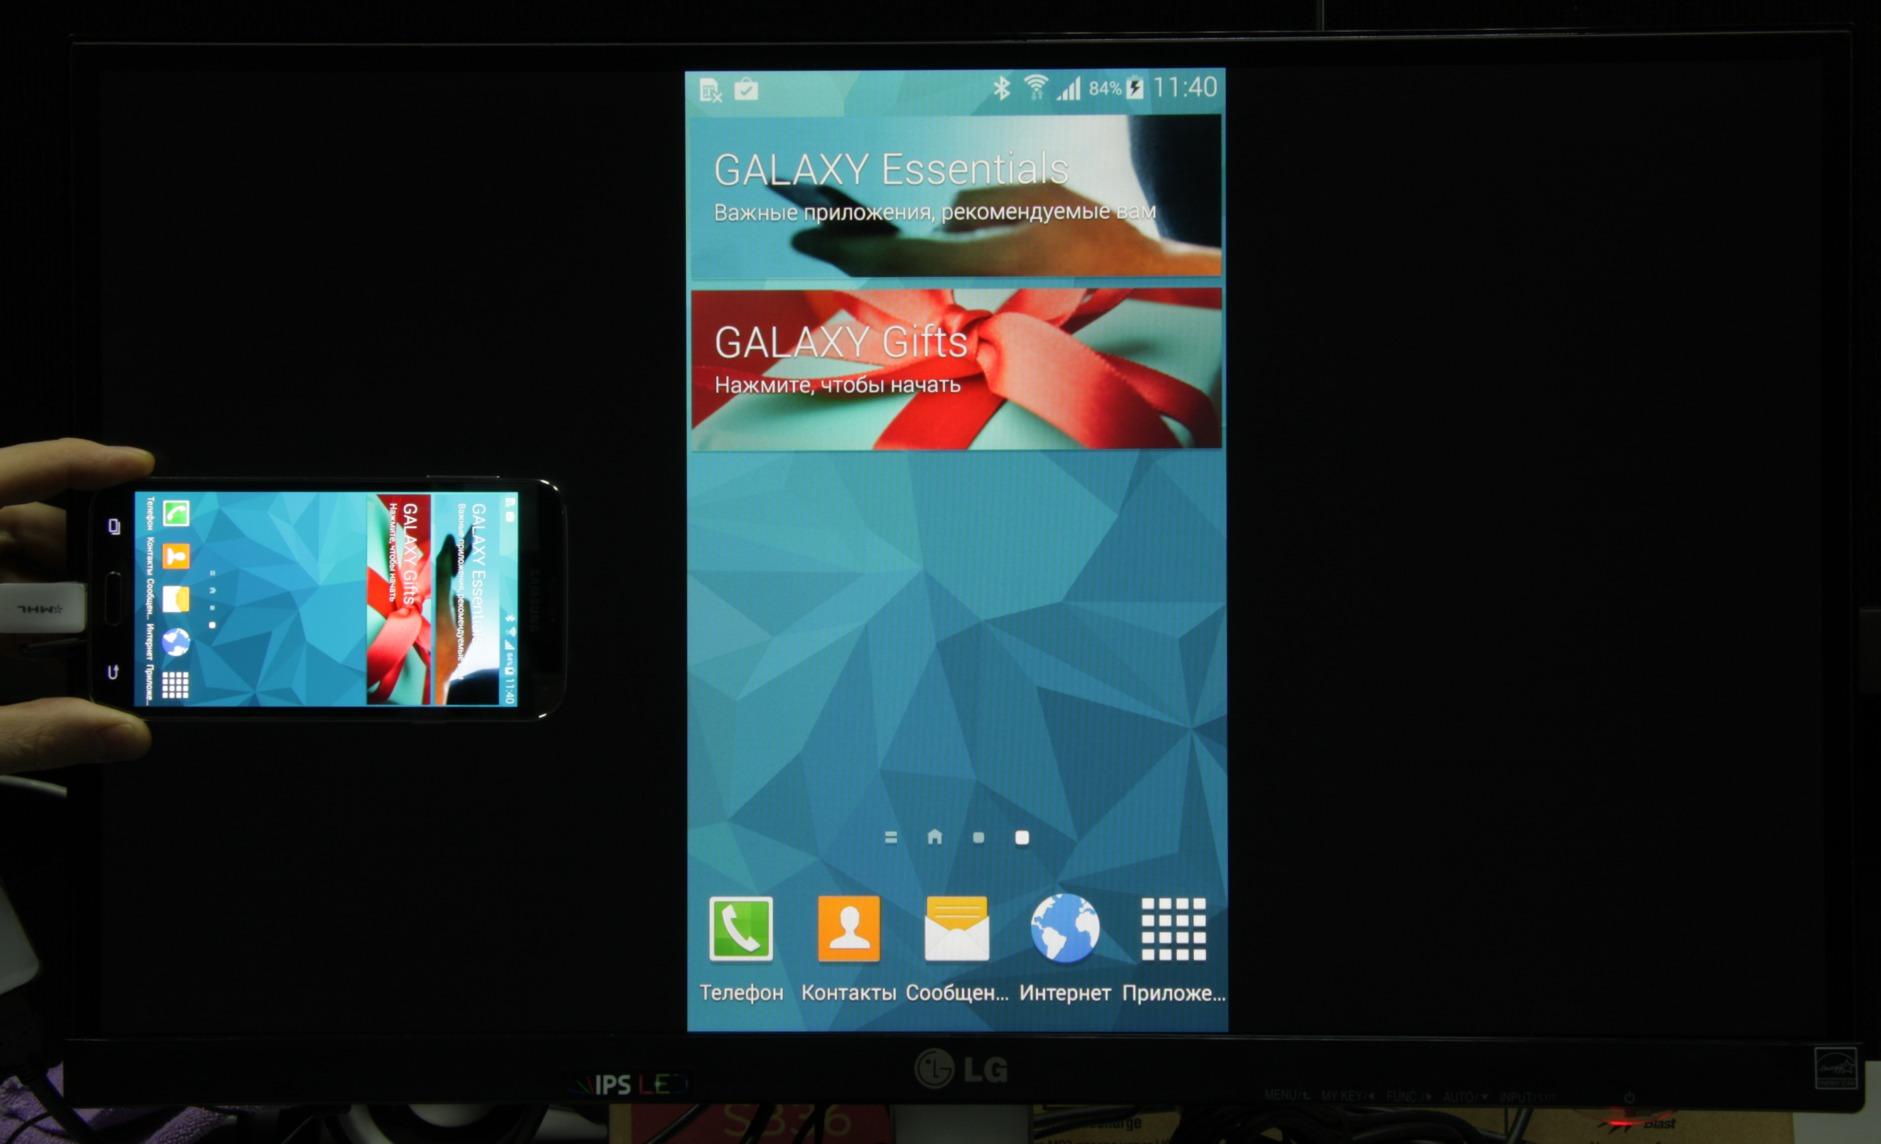 Андроид Не Воспроизводит Видео В Интернете